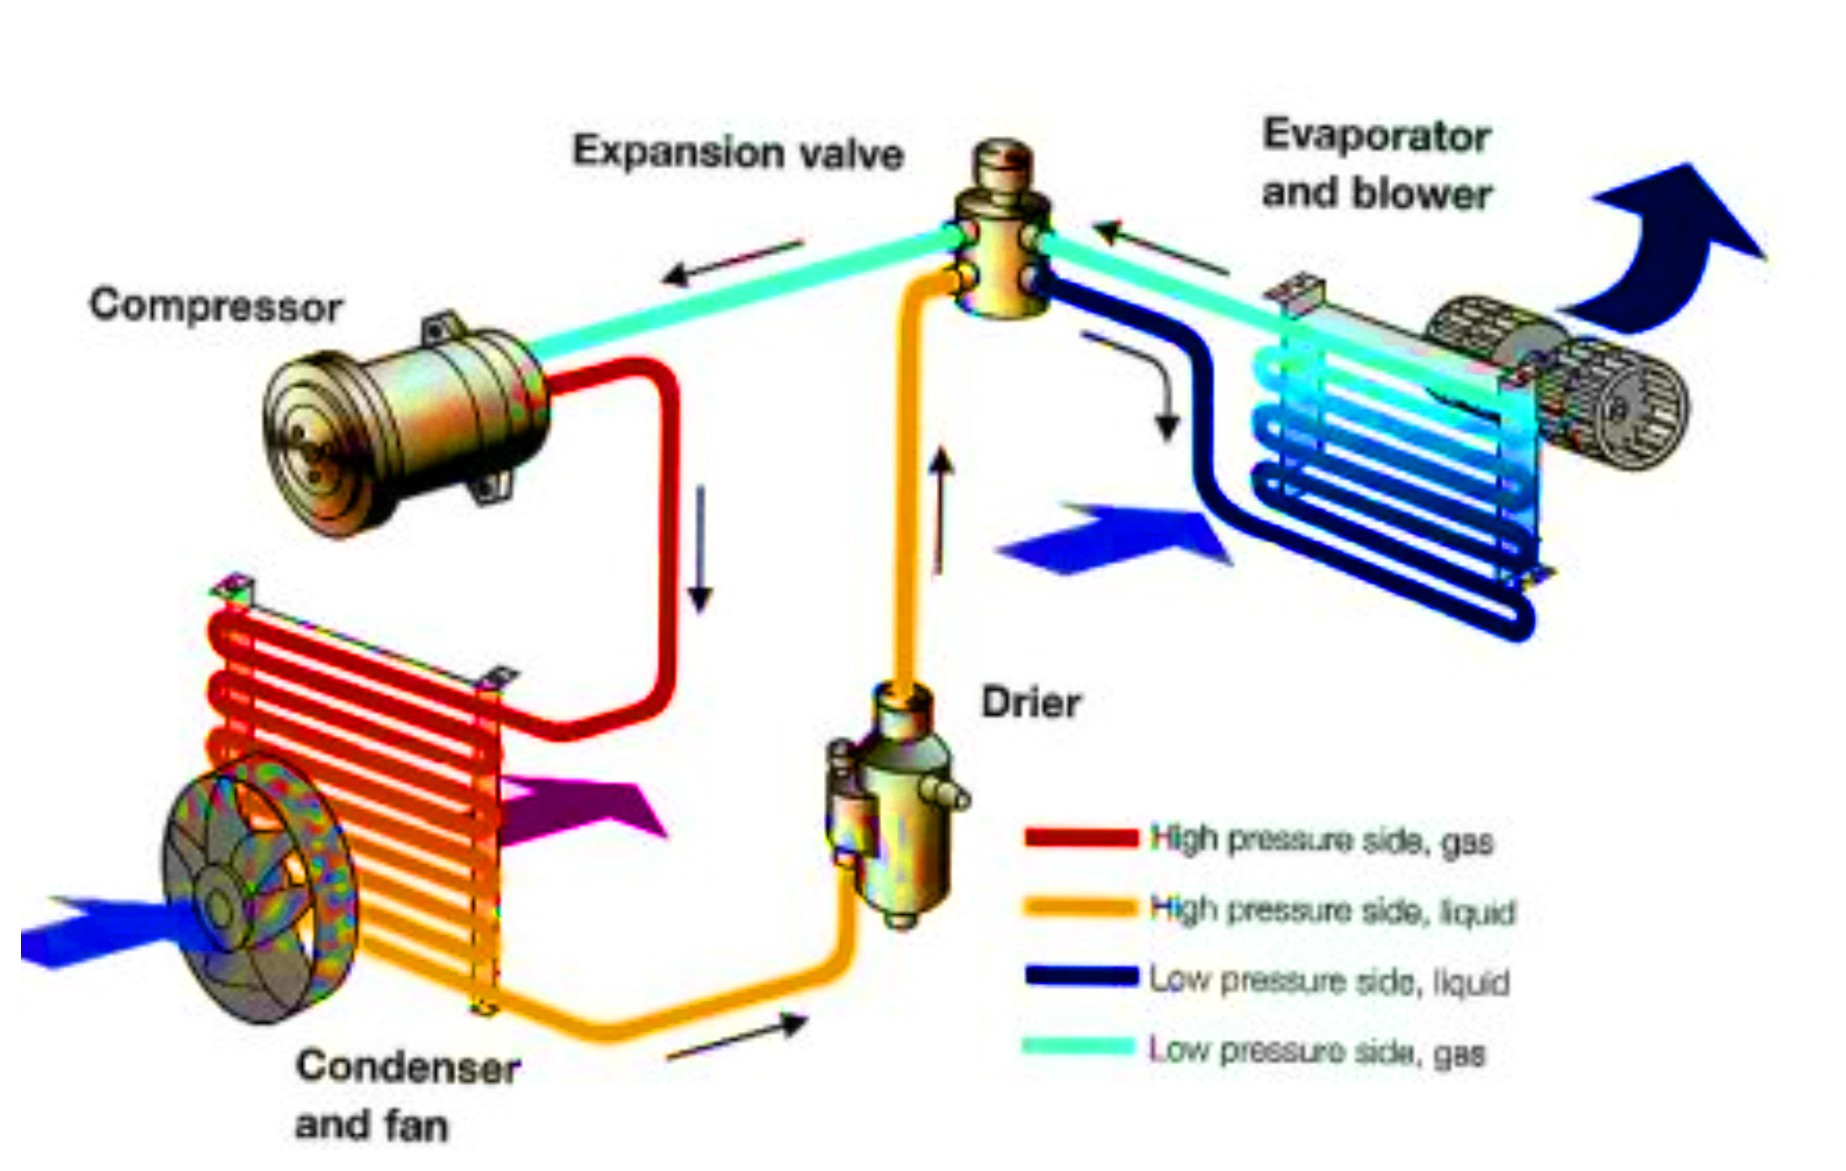 Automobile Ac System Diagram Car Car A C Pressor Wiring Diagram Auto Air Conditioning Of Automobile Ac System Diagram